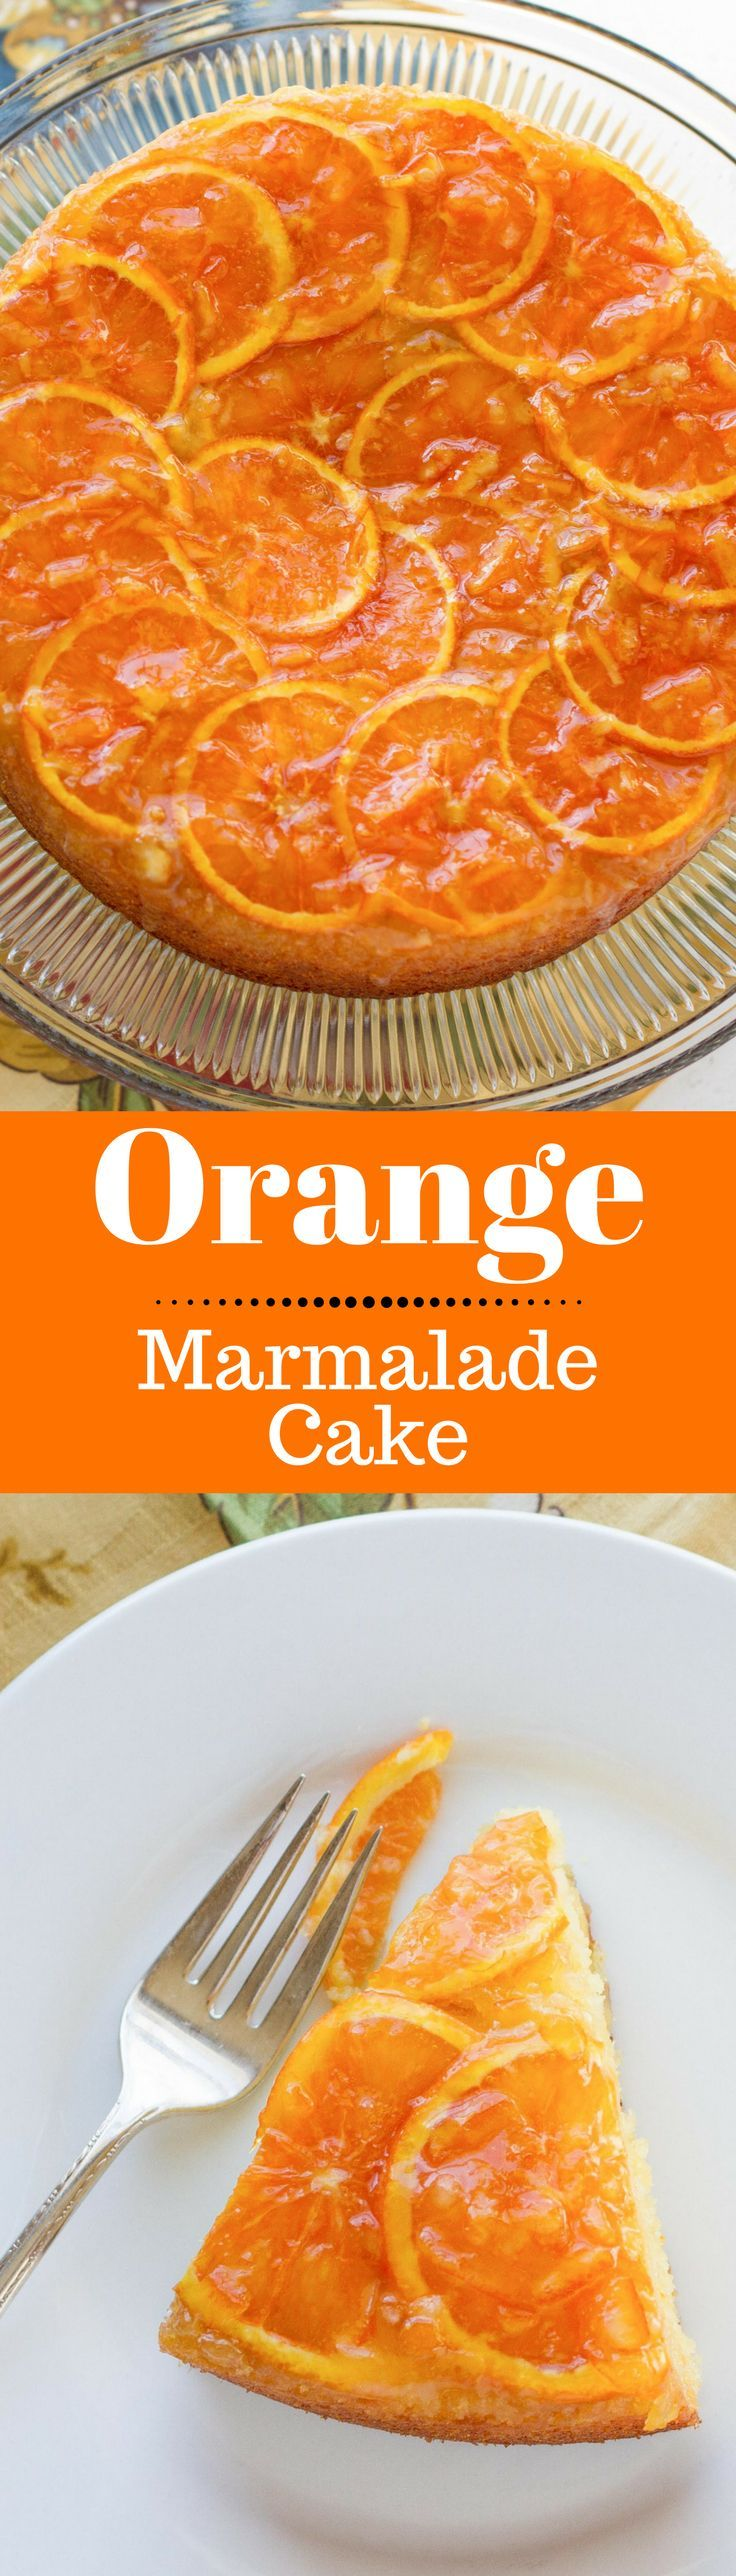 Mary berry marmalade cake recipe